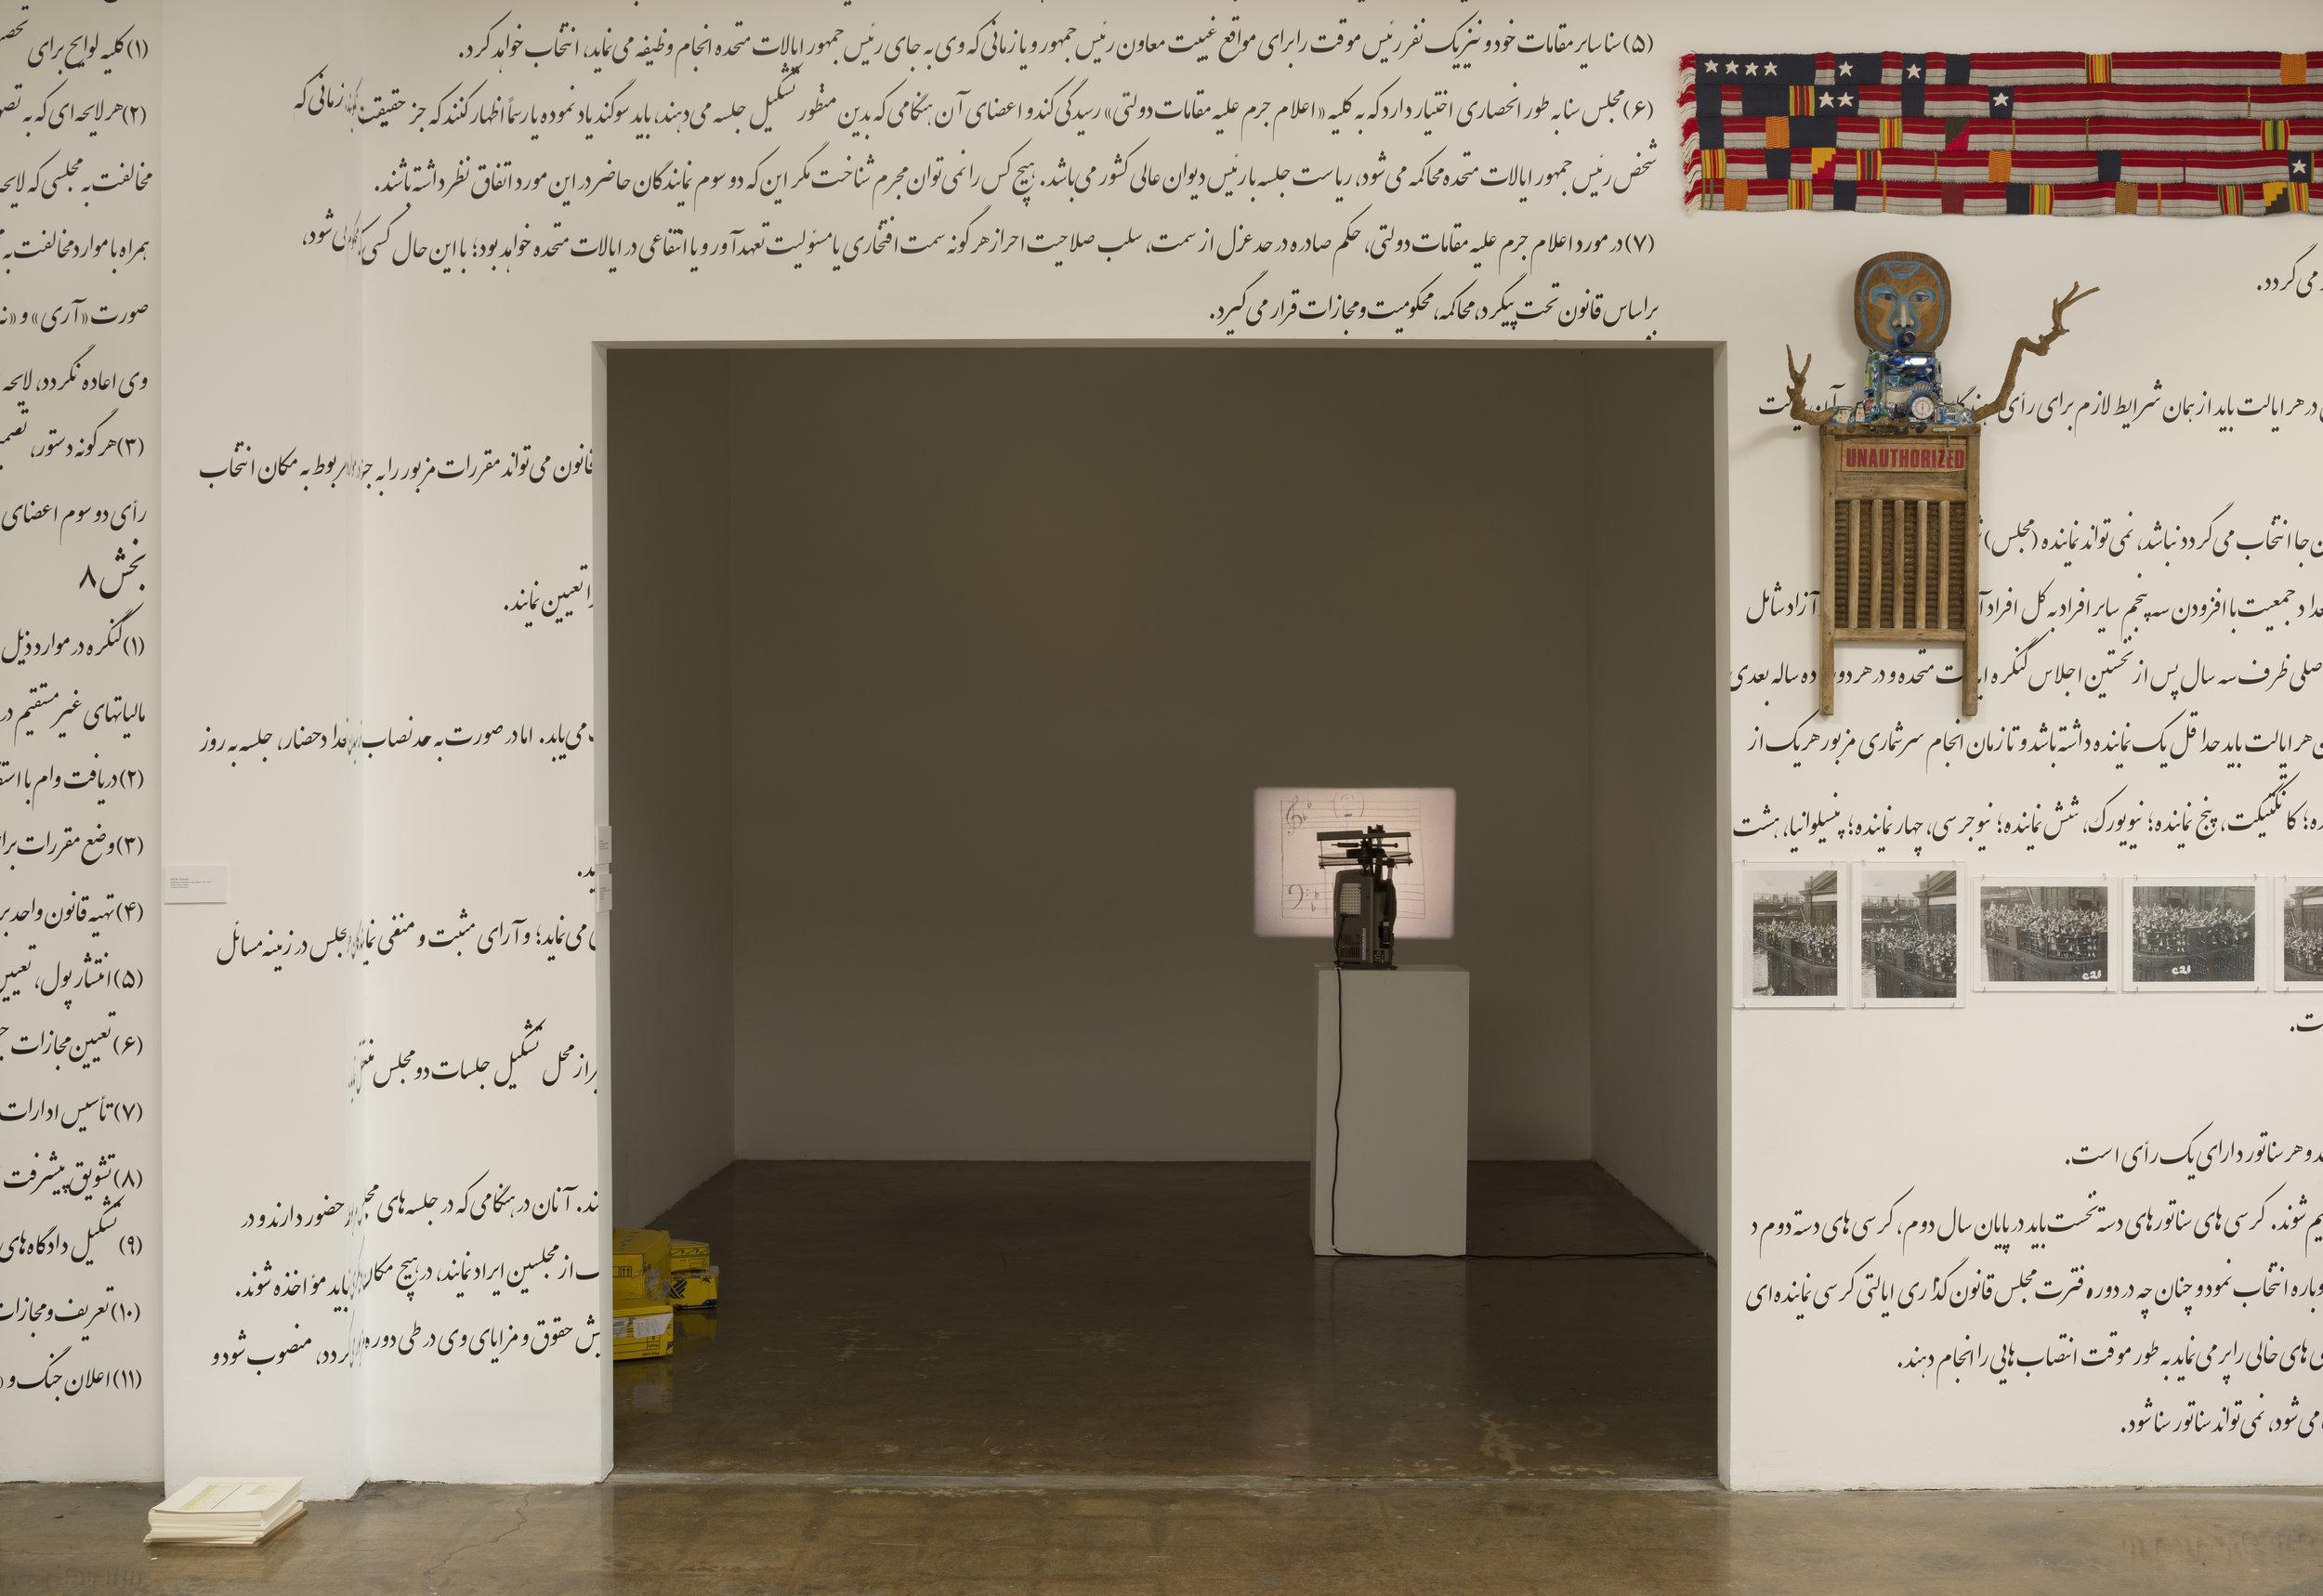 Installation View (Gelare Koshgozaran, Jenny Perlin, Timothy Washington).jpg